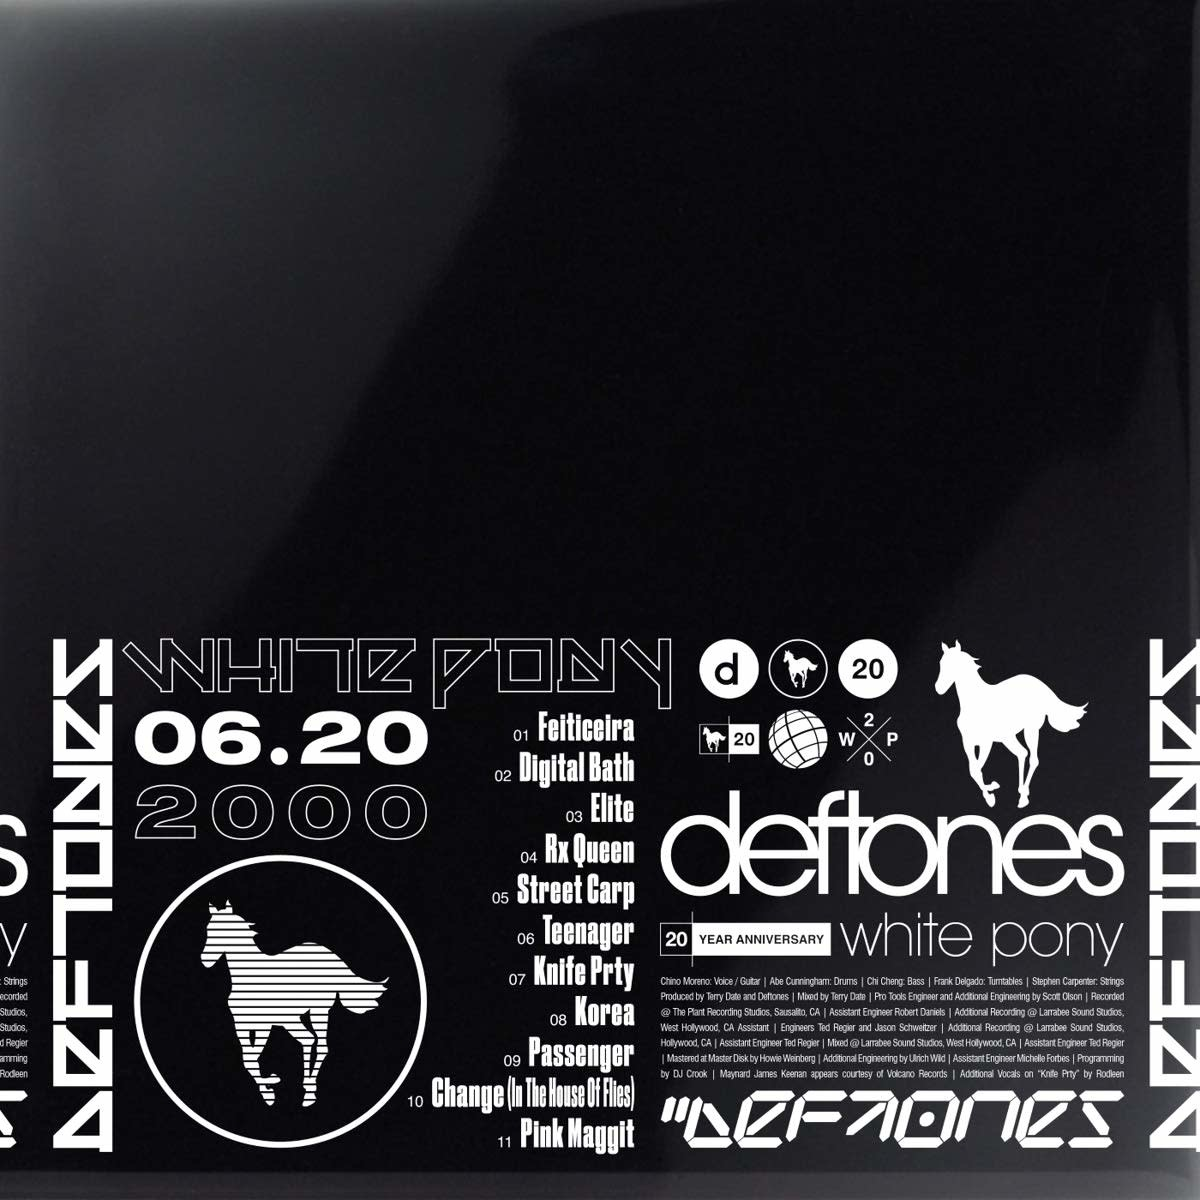 Deftones – White Pony (20th Anniversary Deluxe Edition)